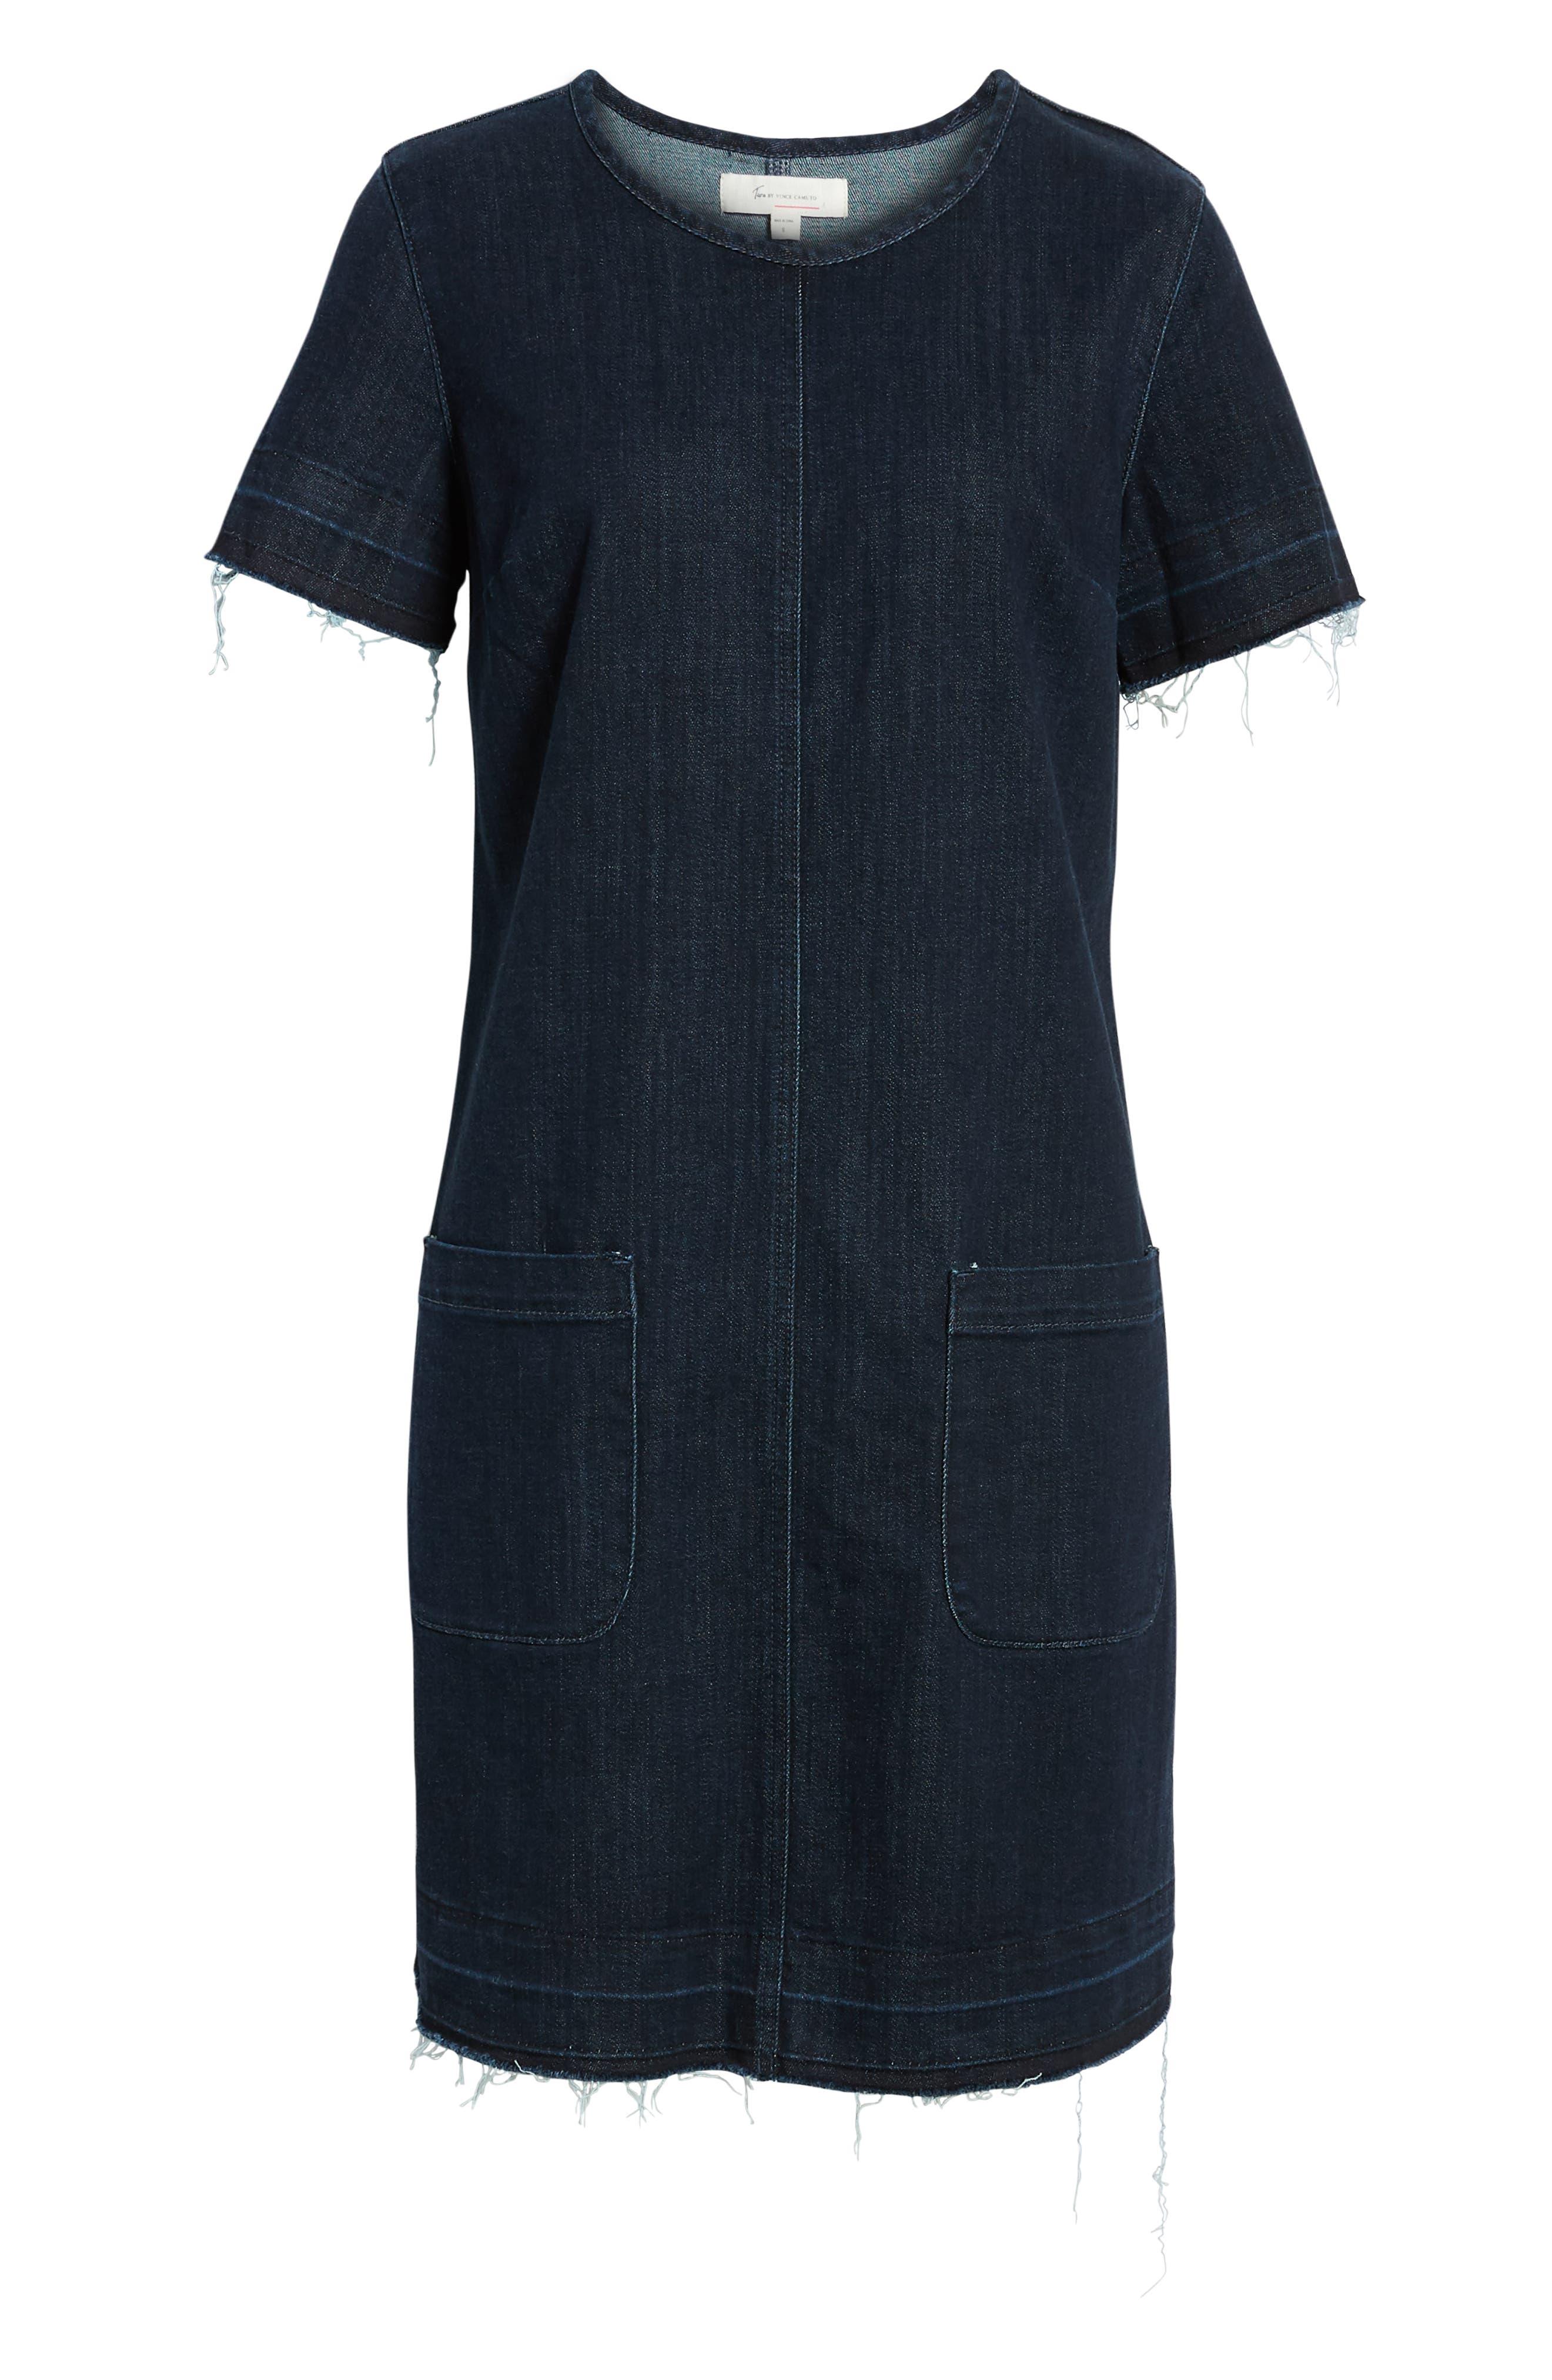 VINCE CAMUTO,                             Release Hem Denim Dress,                             Alternate thumbnail 3, color,                             DARK AUTHENTIC